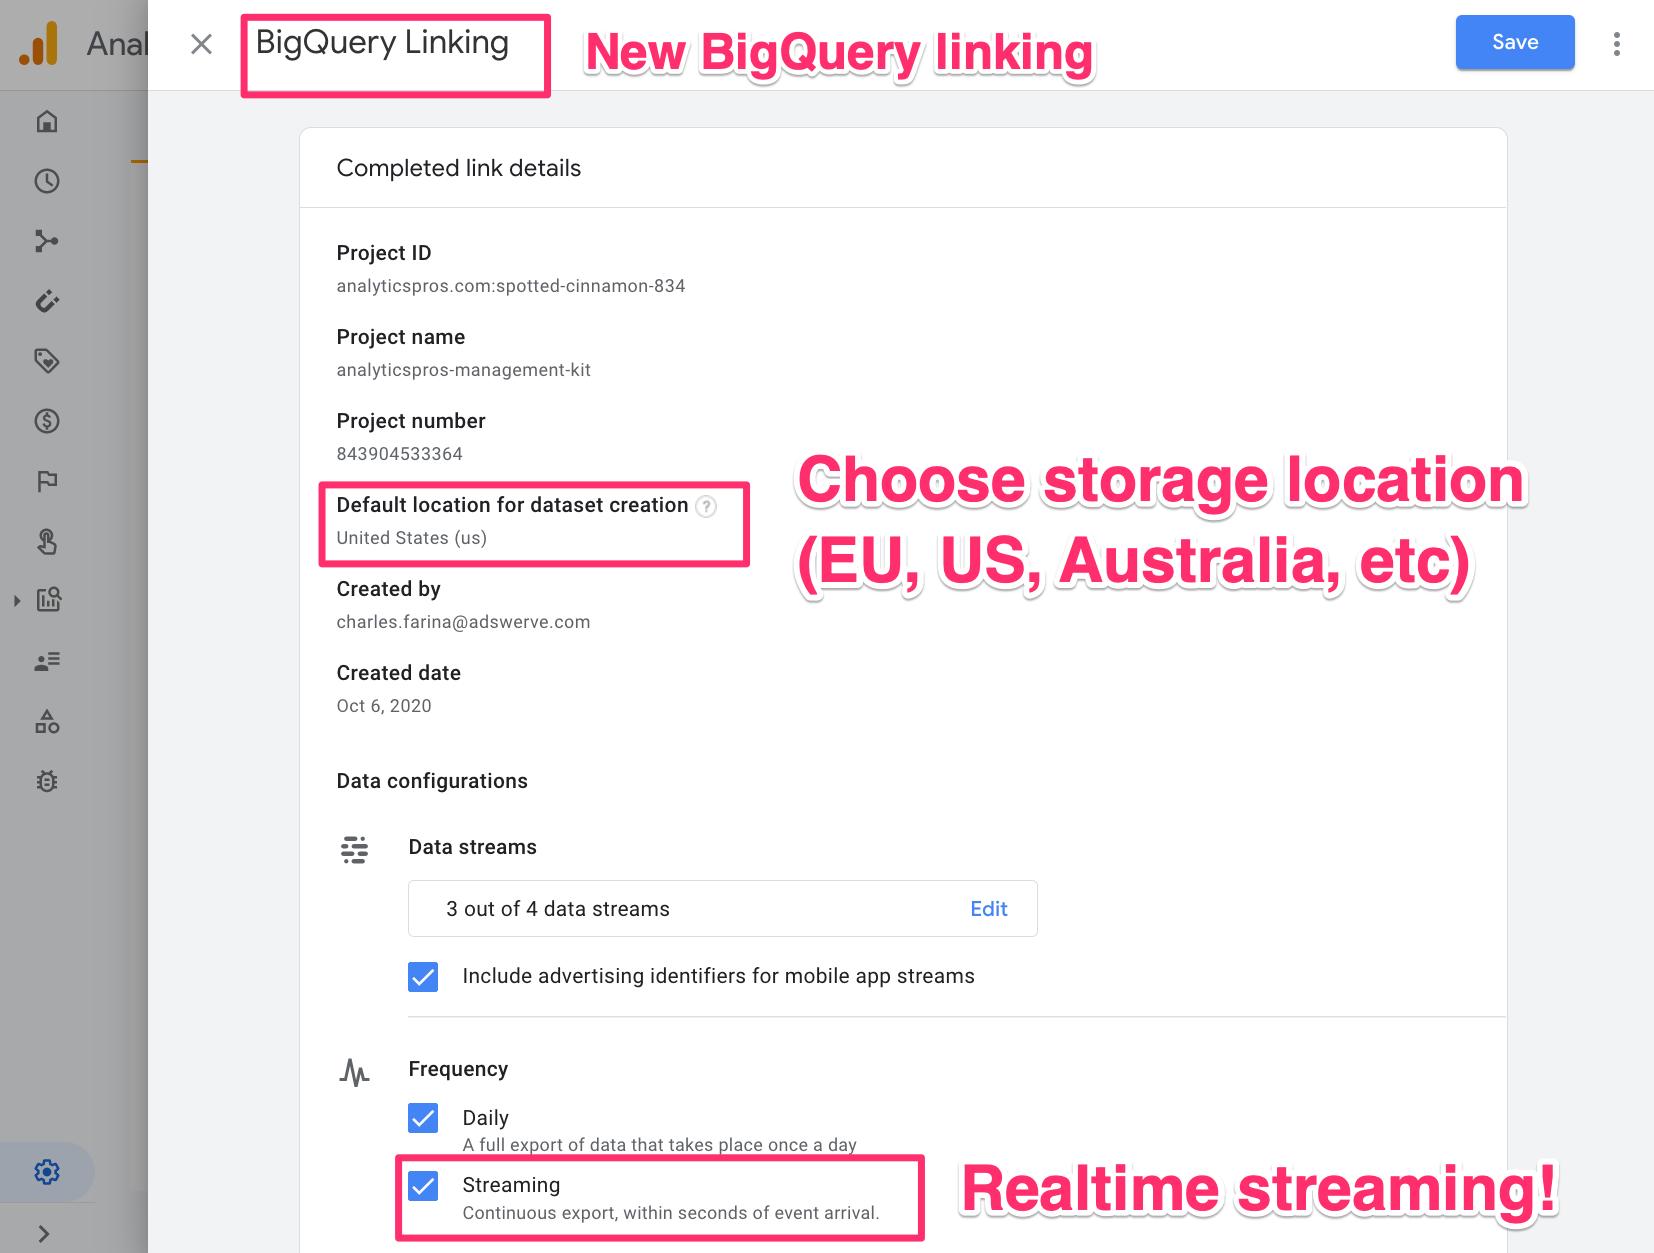 BigQuery Linking - GA4